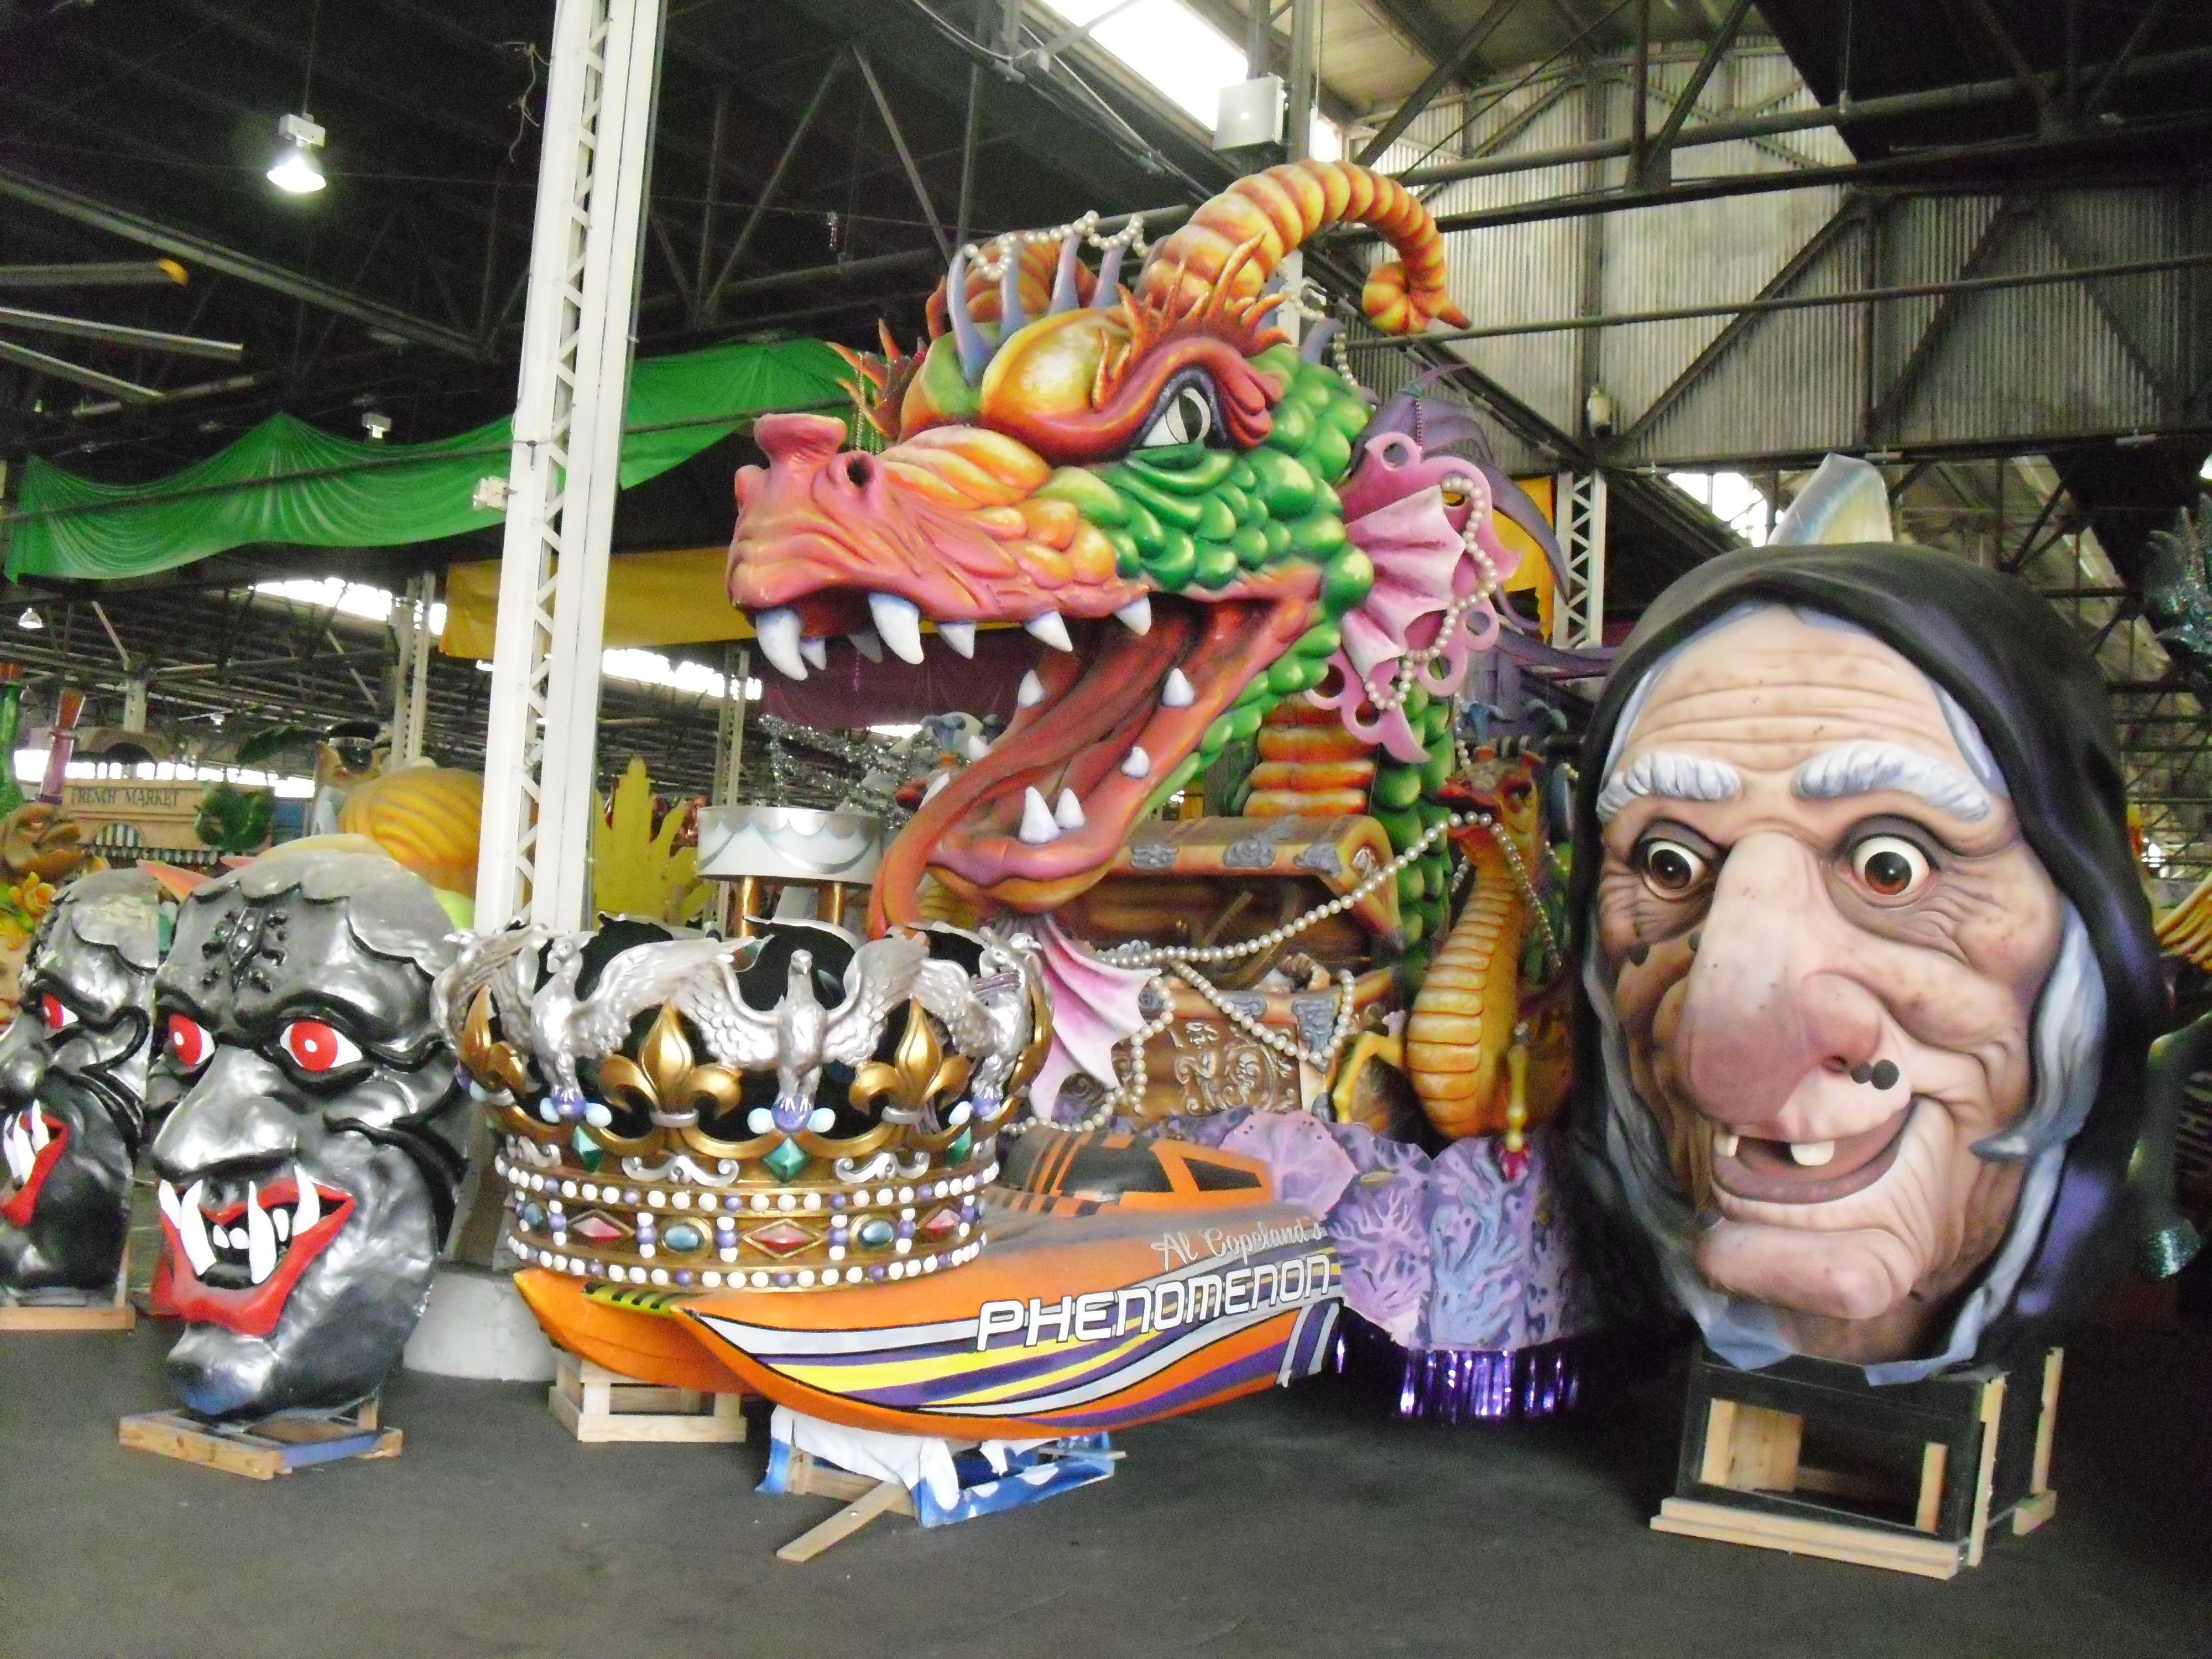 Mardi Gras Float Clip Art Mardi Gras World